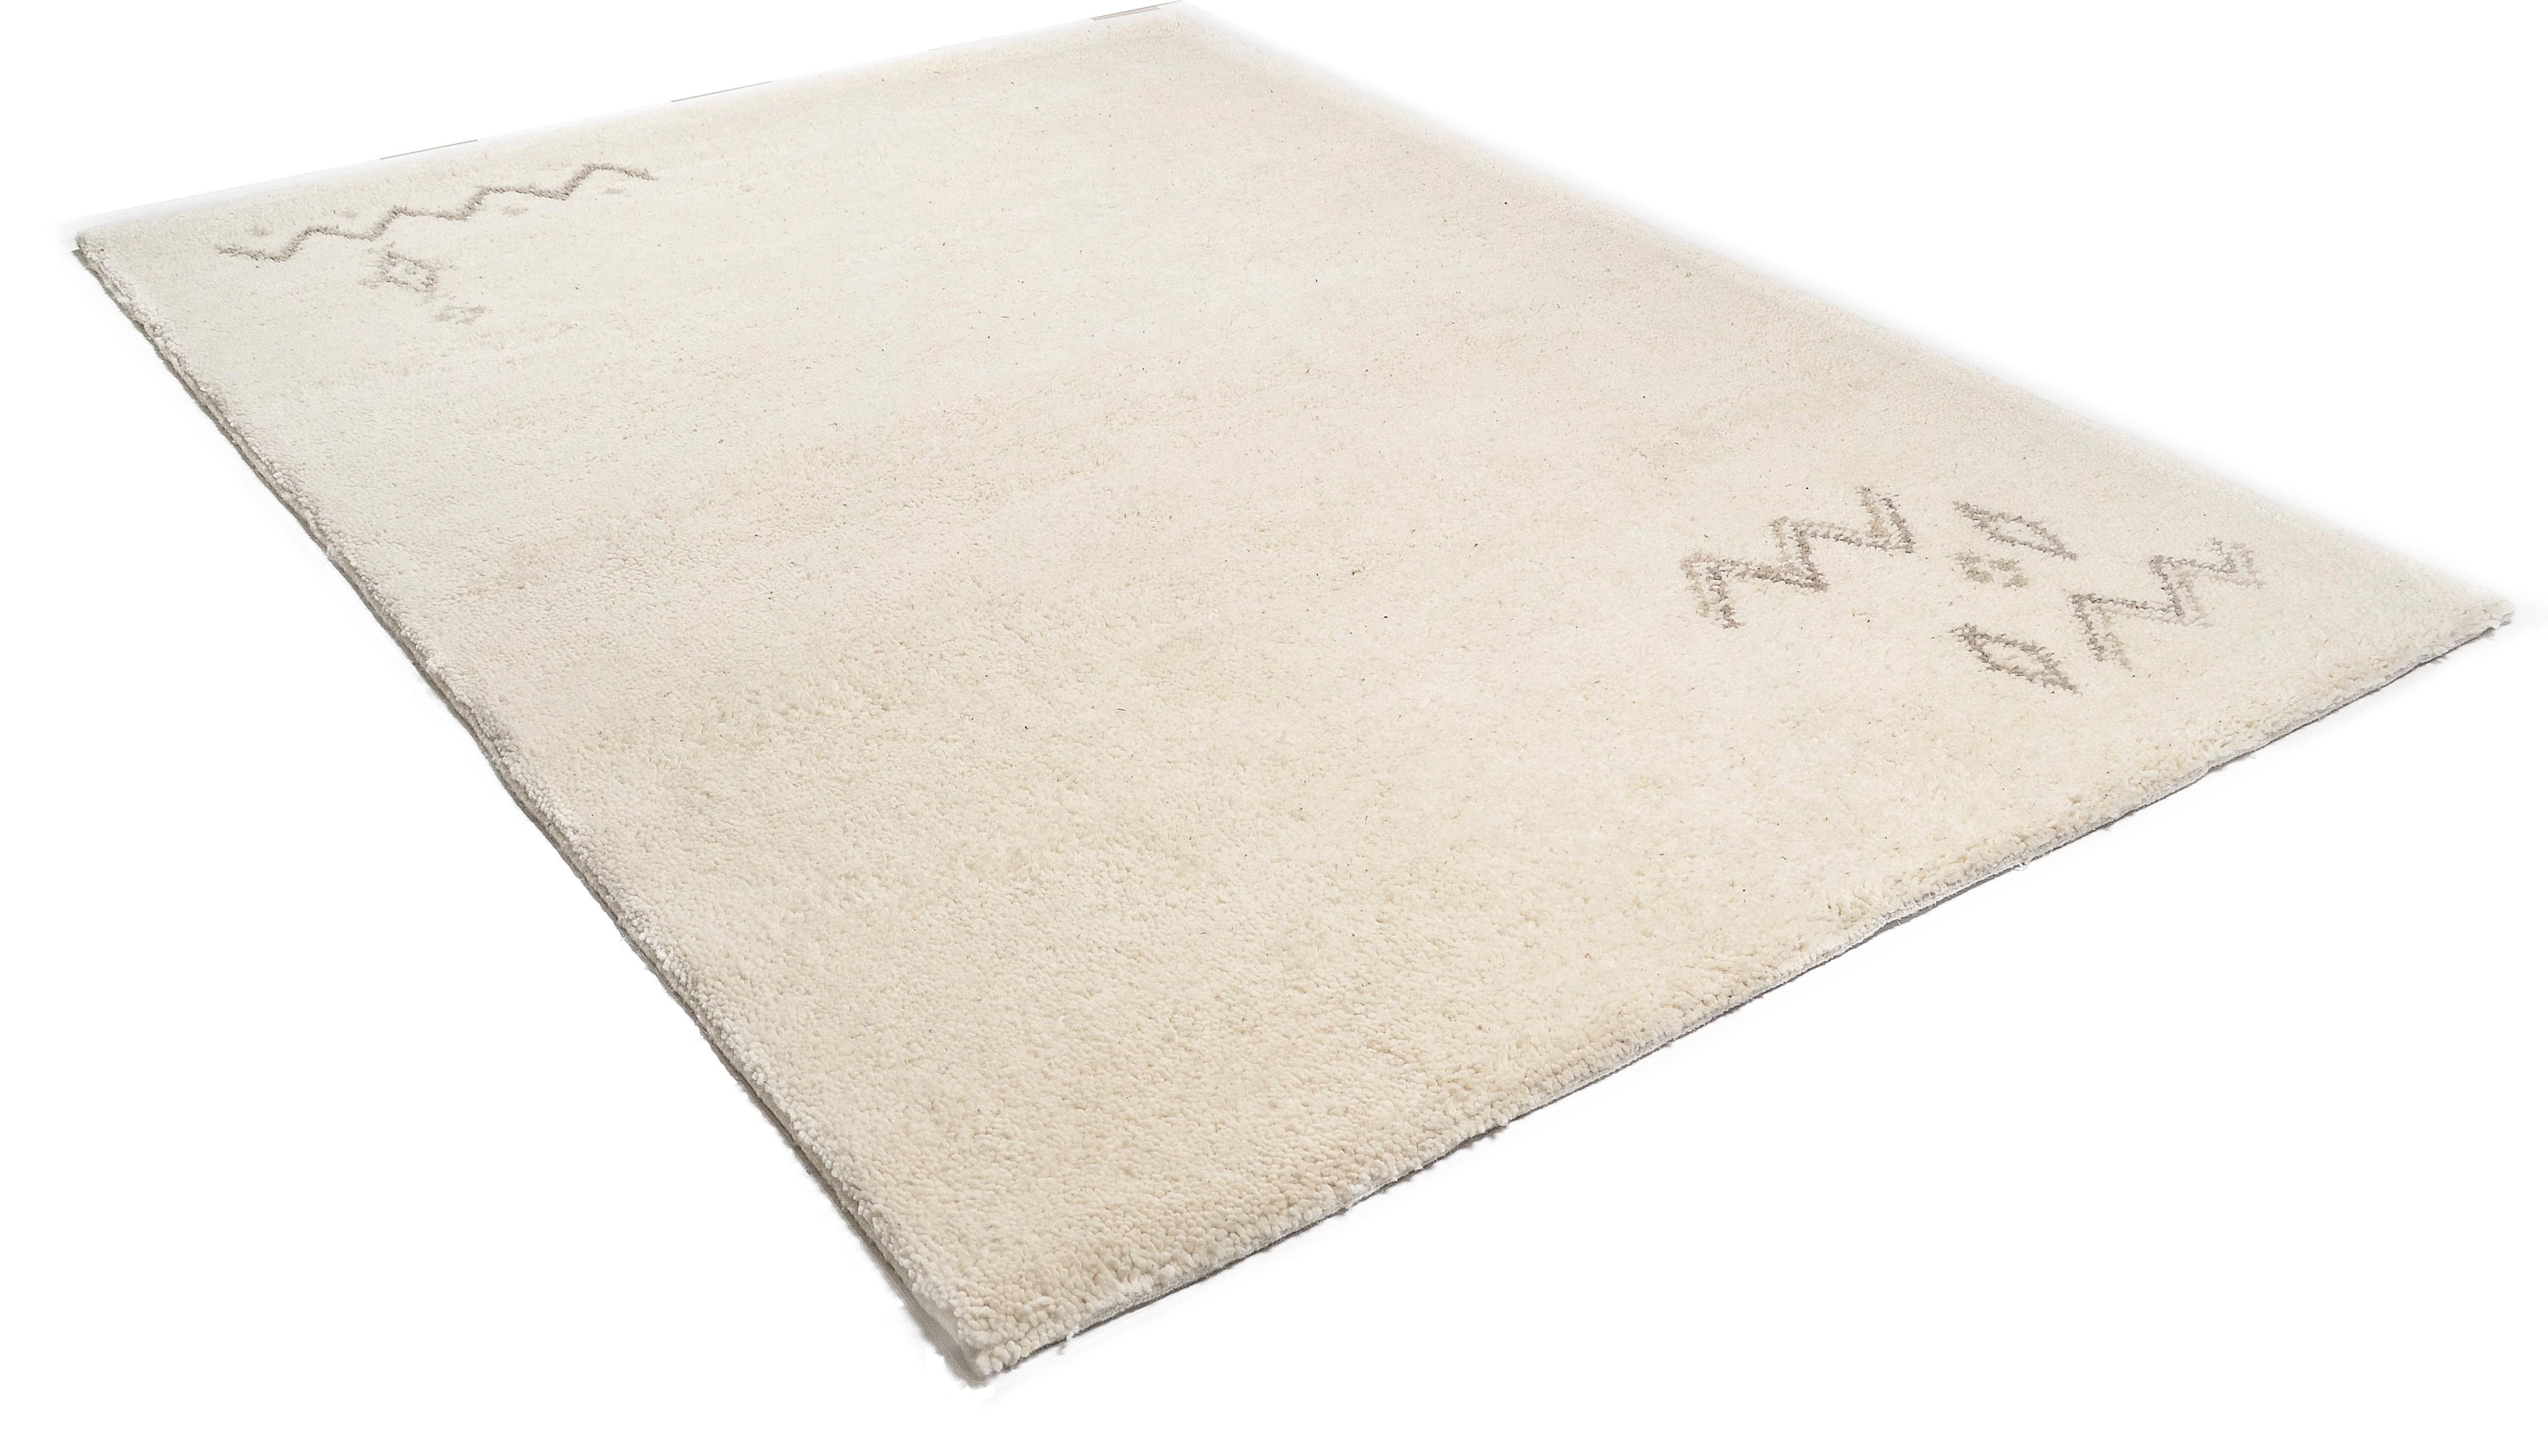 berber teppich maghreb gemustert handgekn pft reine wolle 15 15 simple knoten ebay. Black Bedroom Furniture Sets. Home Design Ideas